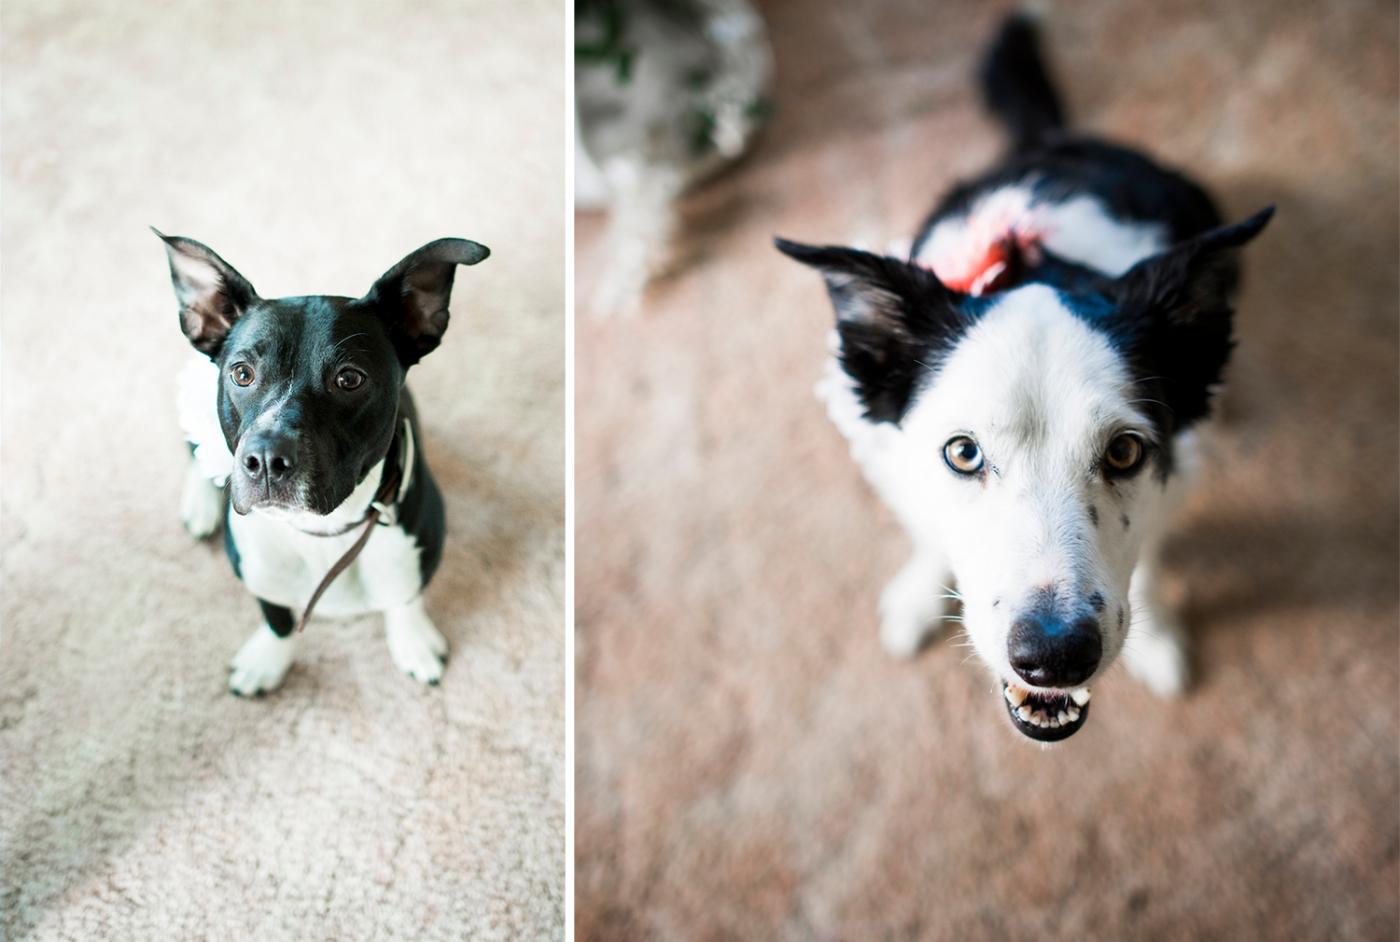 JaneS_photography_Seattle_2016_Kelsie_and_Kody_DSC_0780 copy dogs horizontal